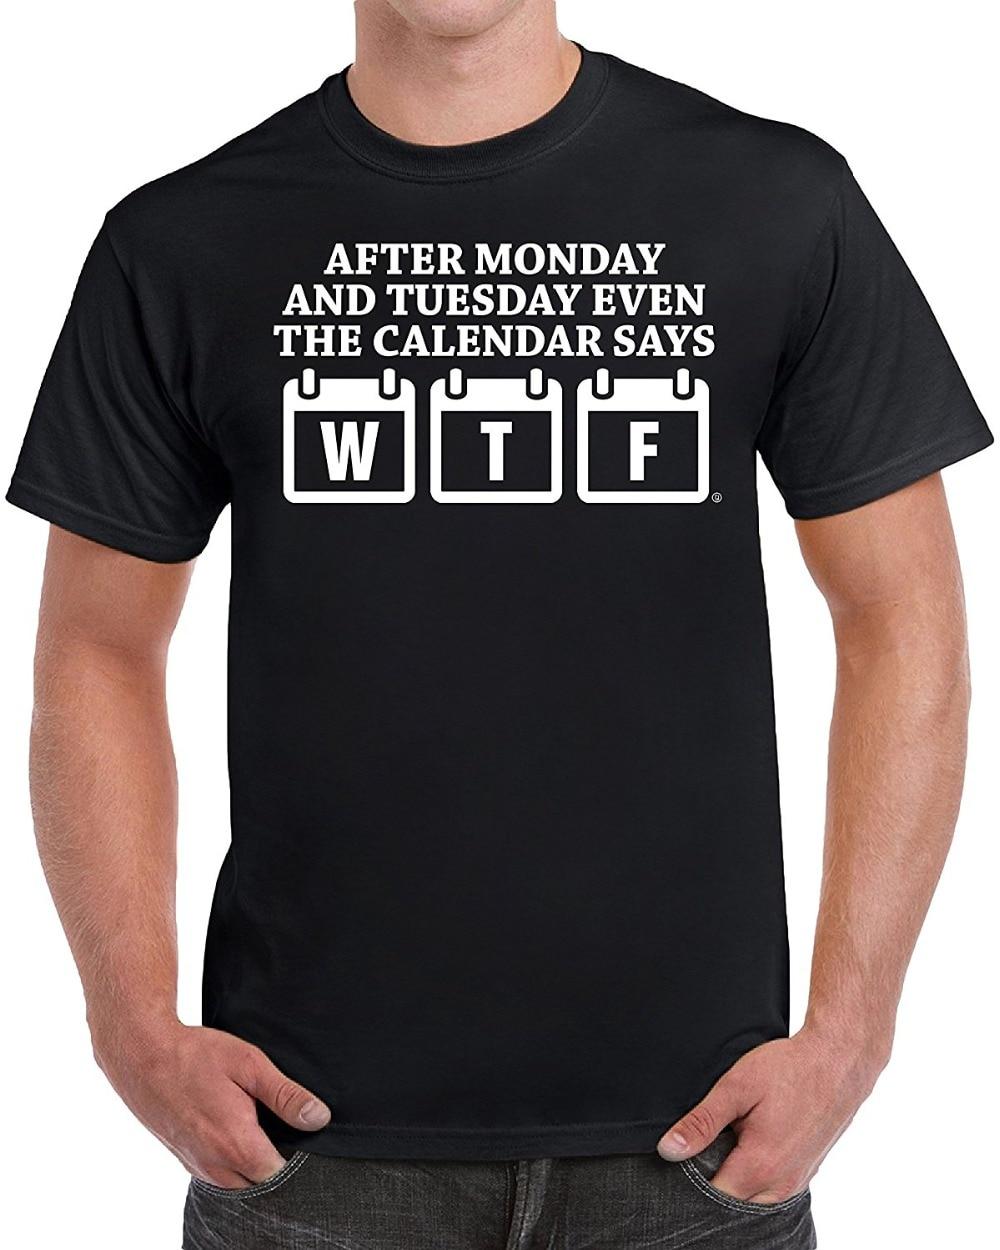 2018 Baru Kedatangan Setelah Hari Senin Dan Selasa Bahkan